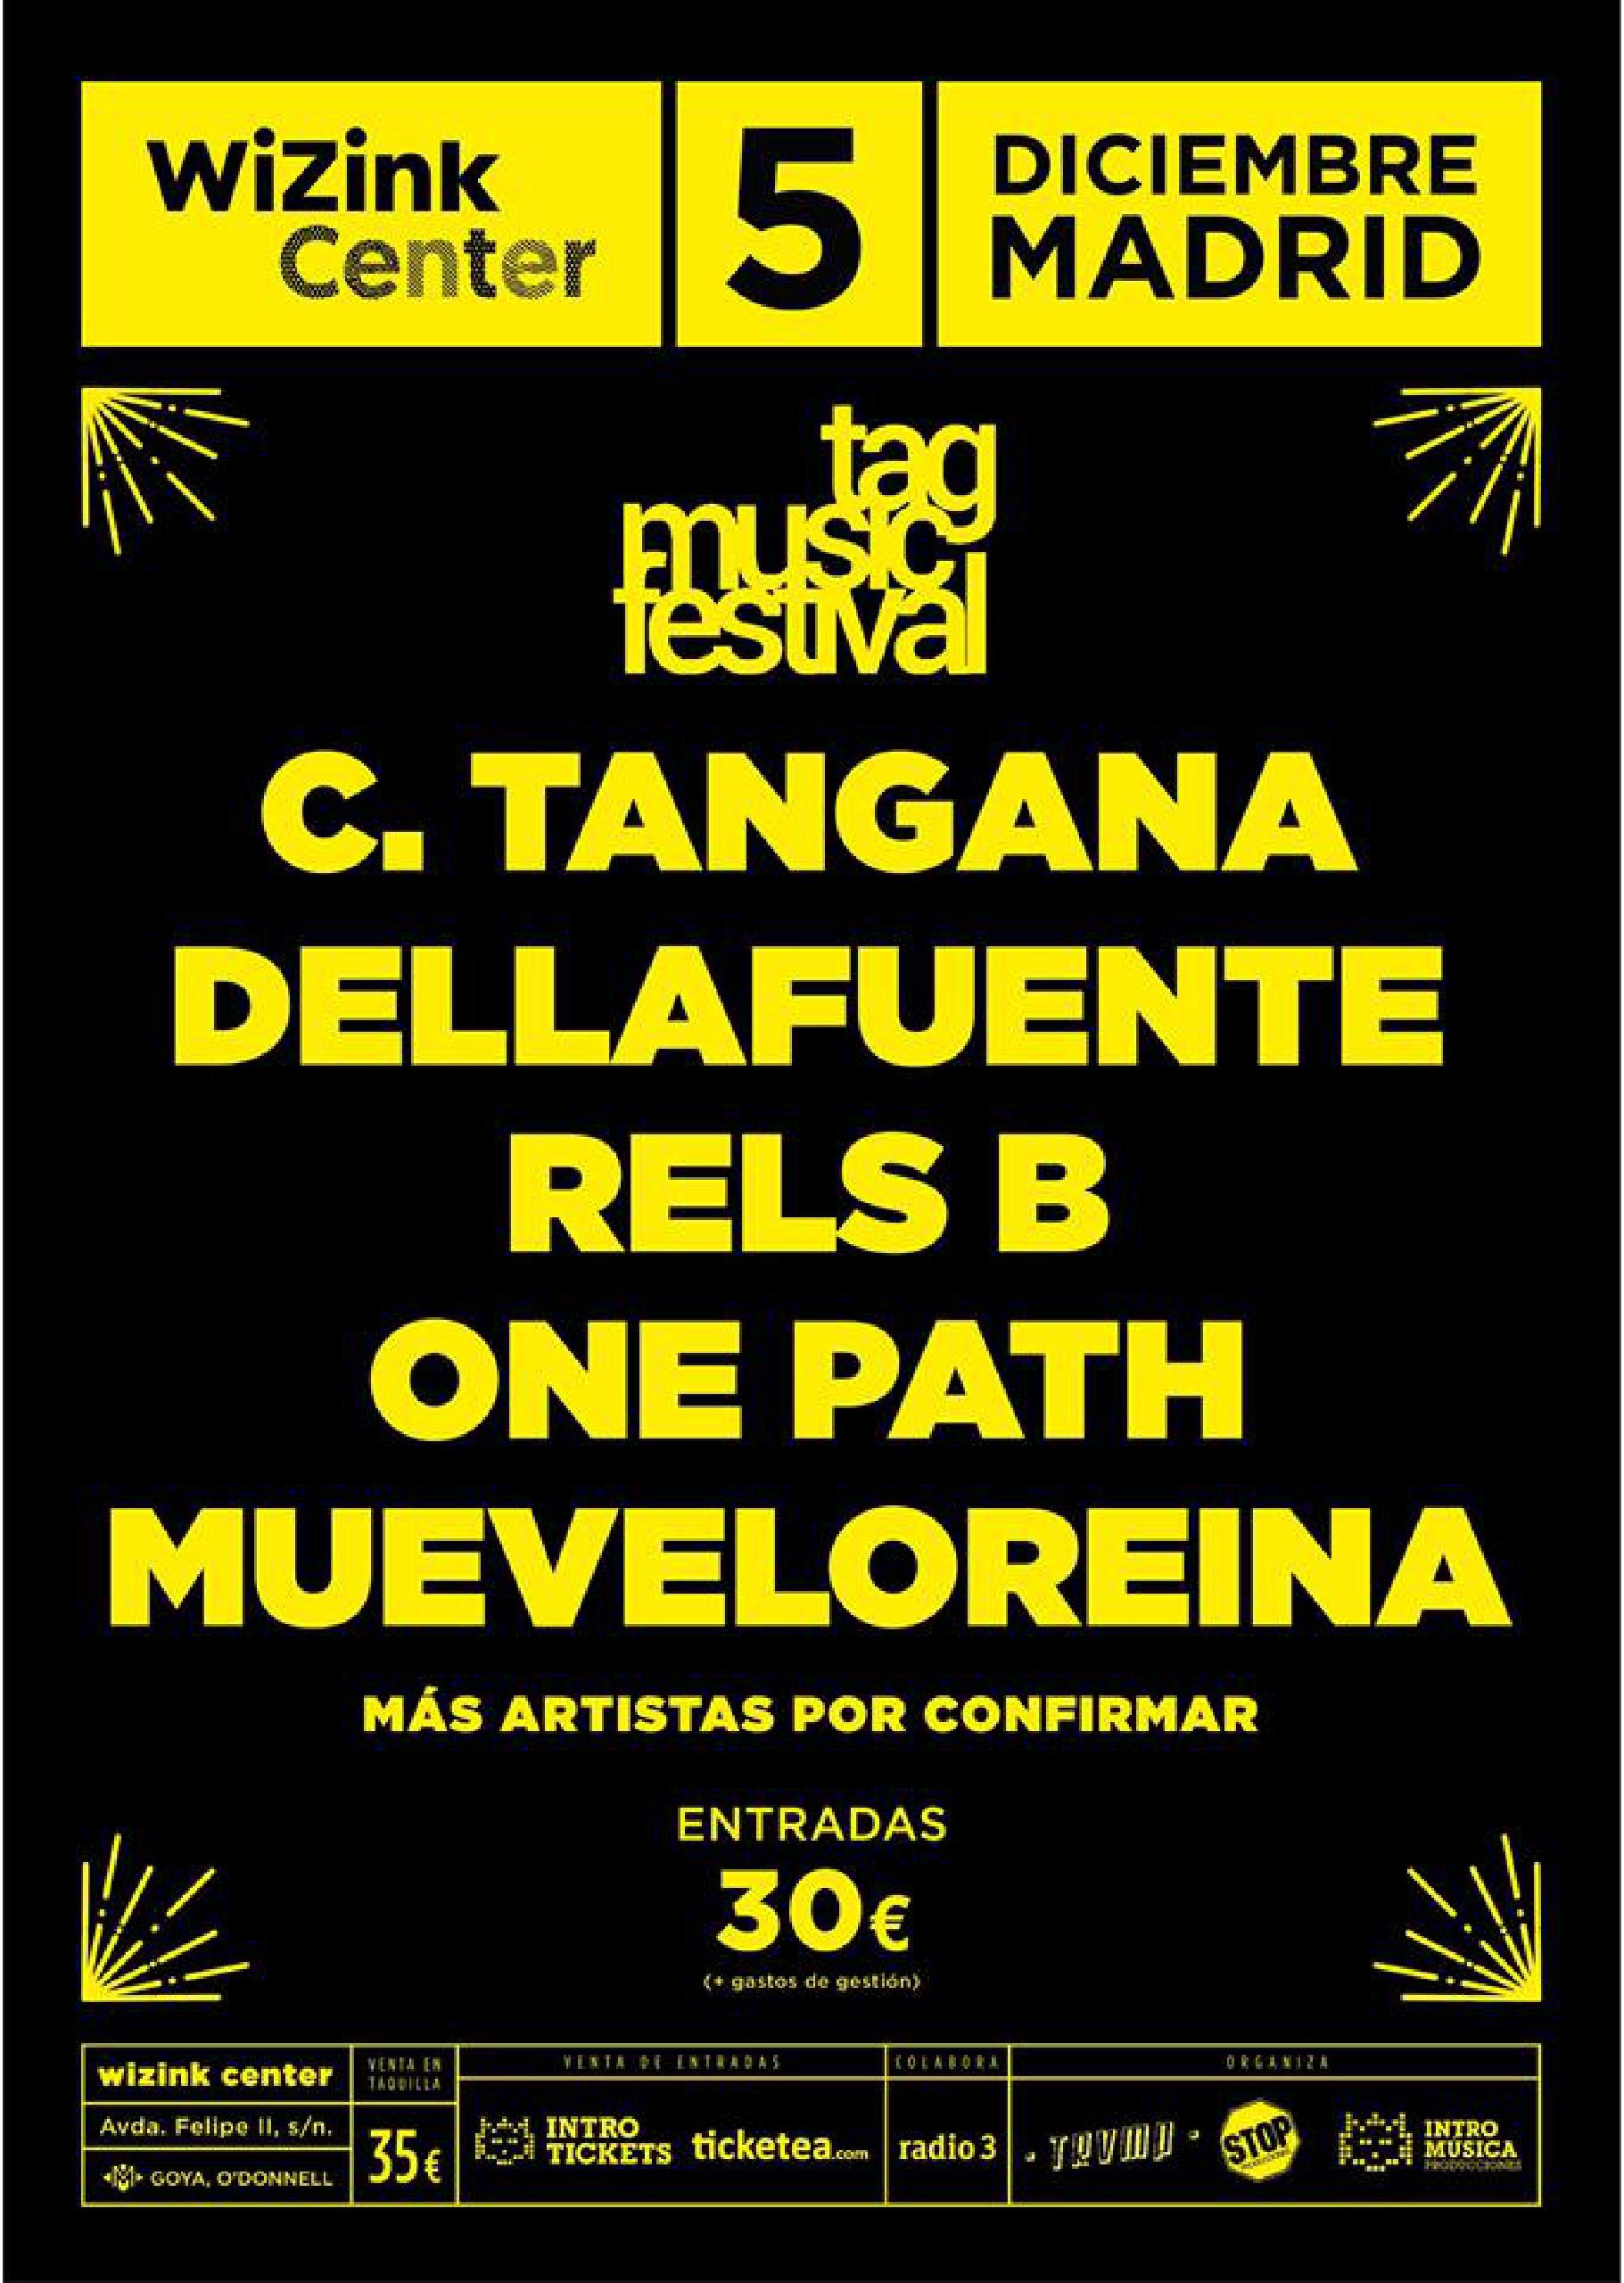 Cartel del TAG Music Festival de Madrid